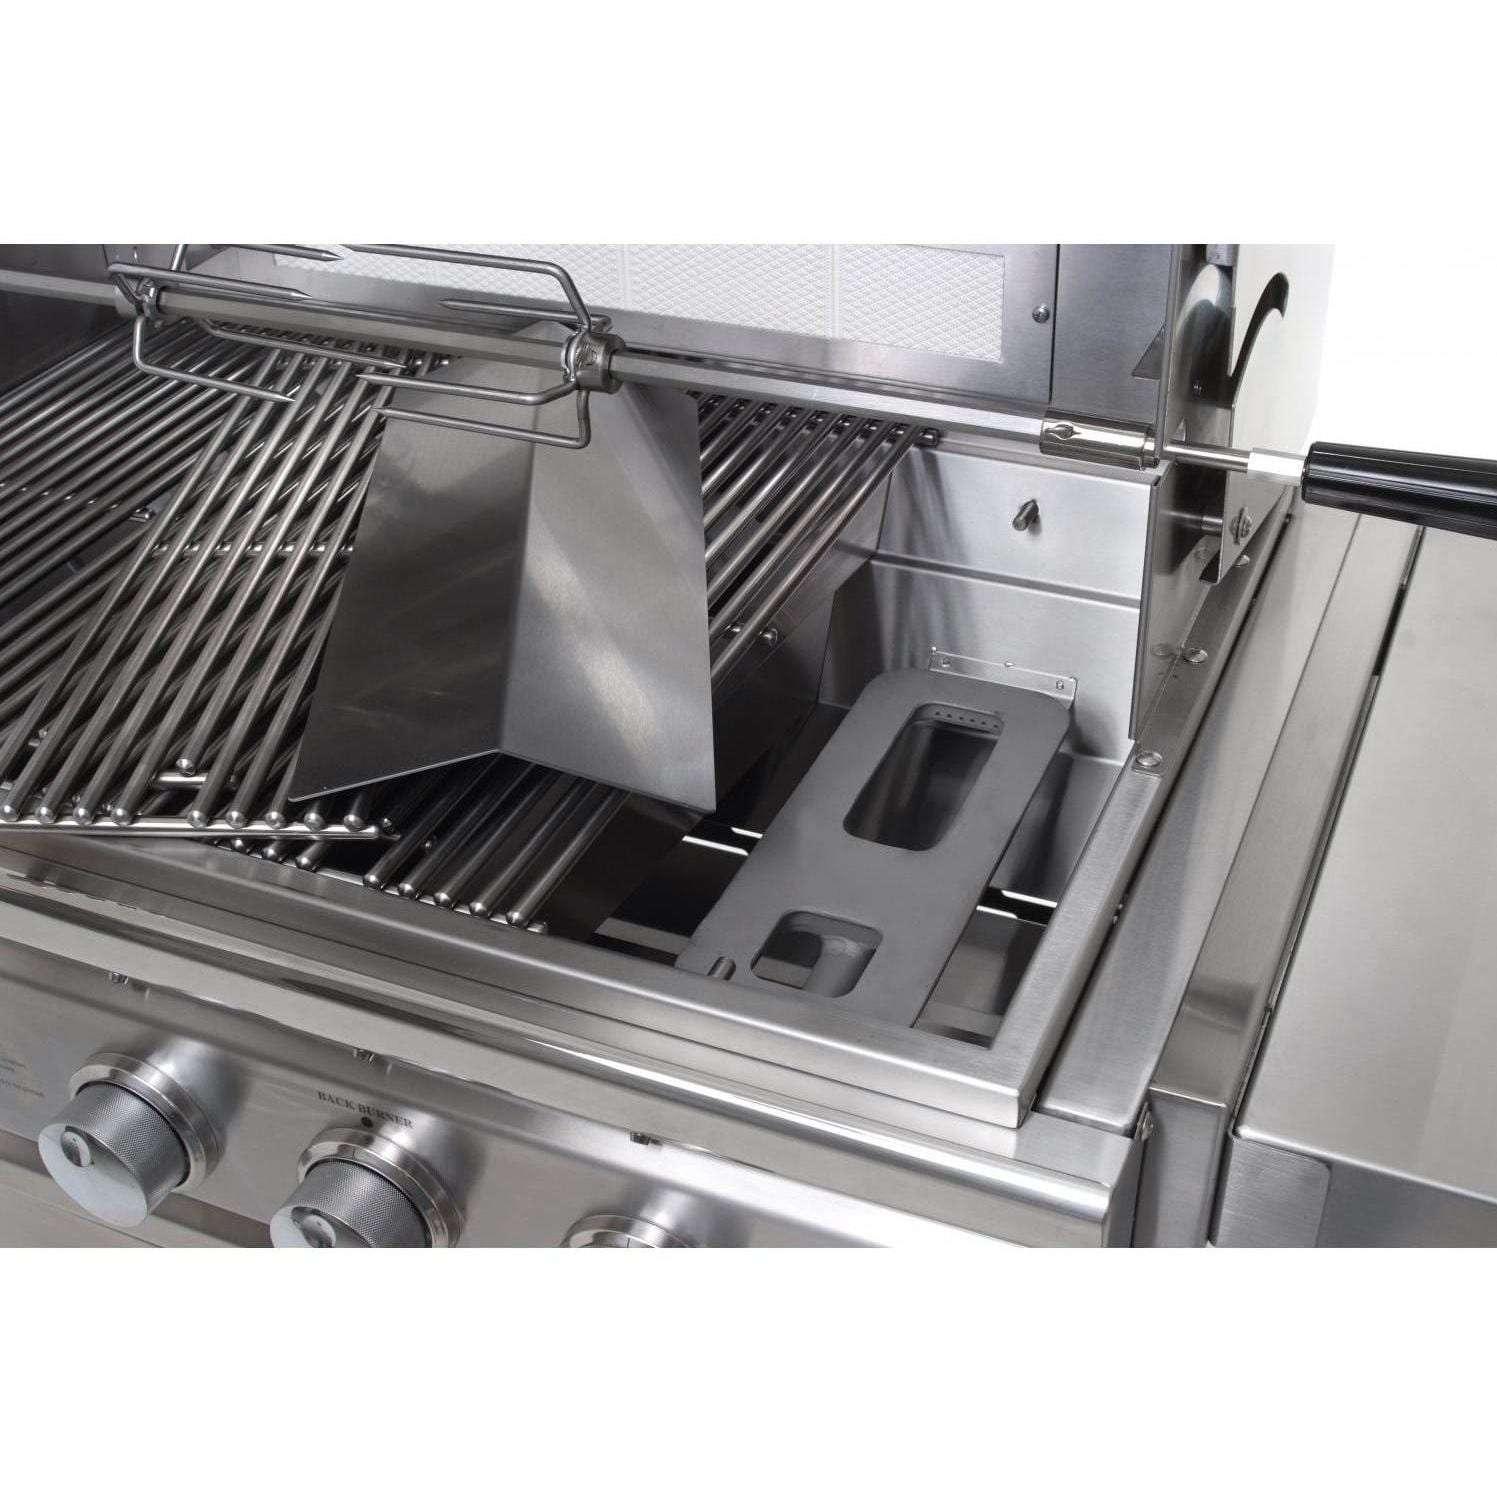 RCS Cutlass Pro Burner